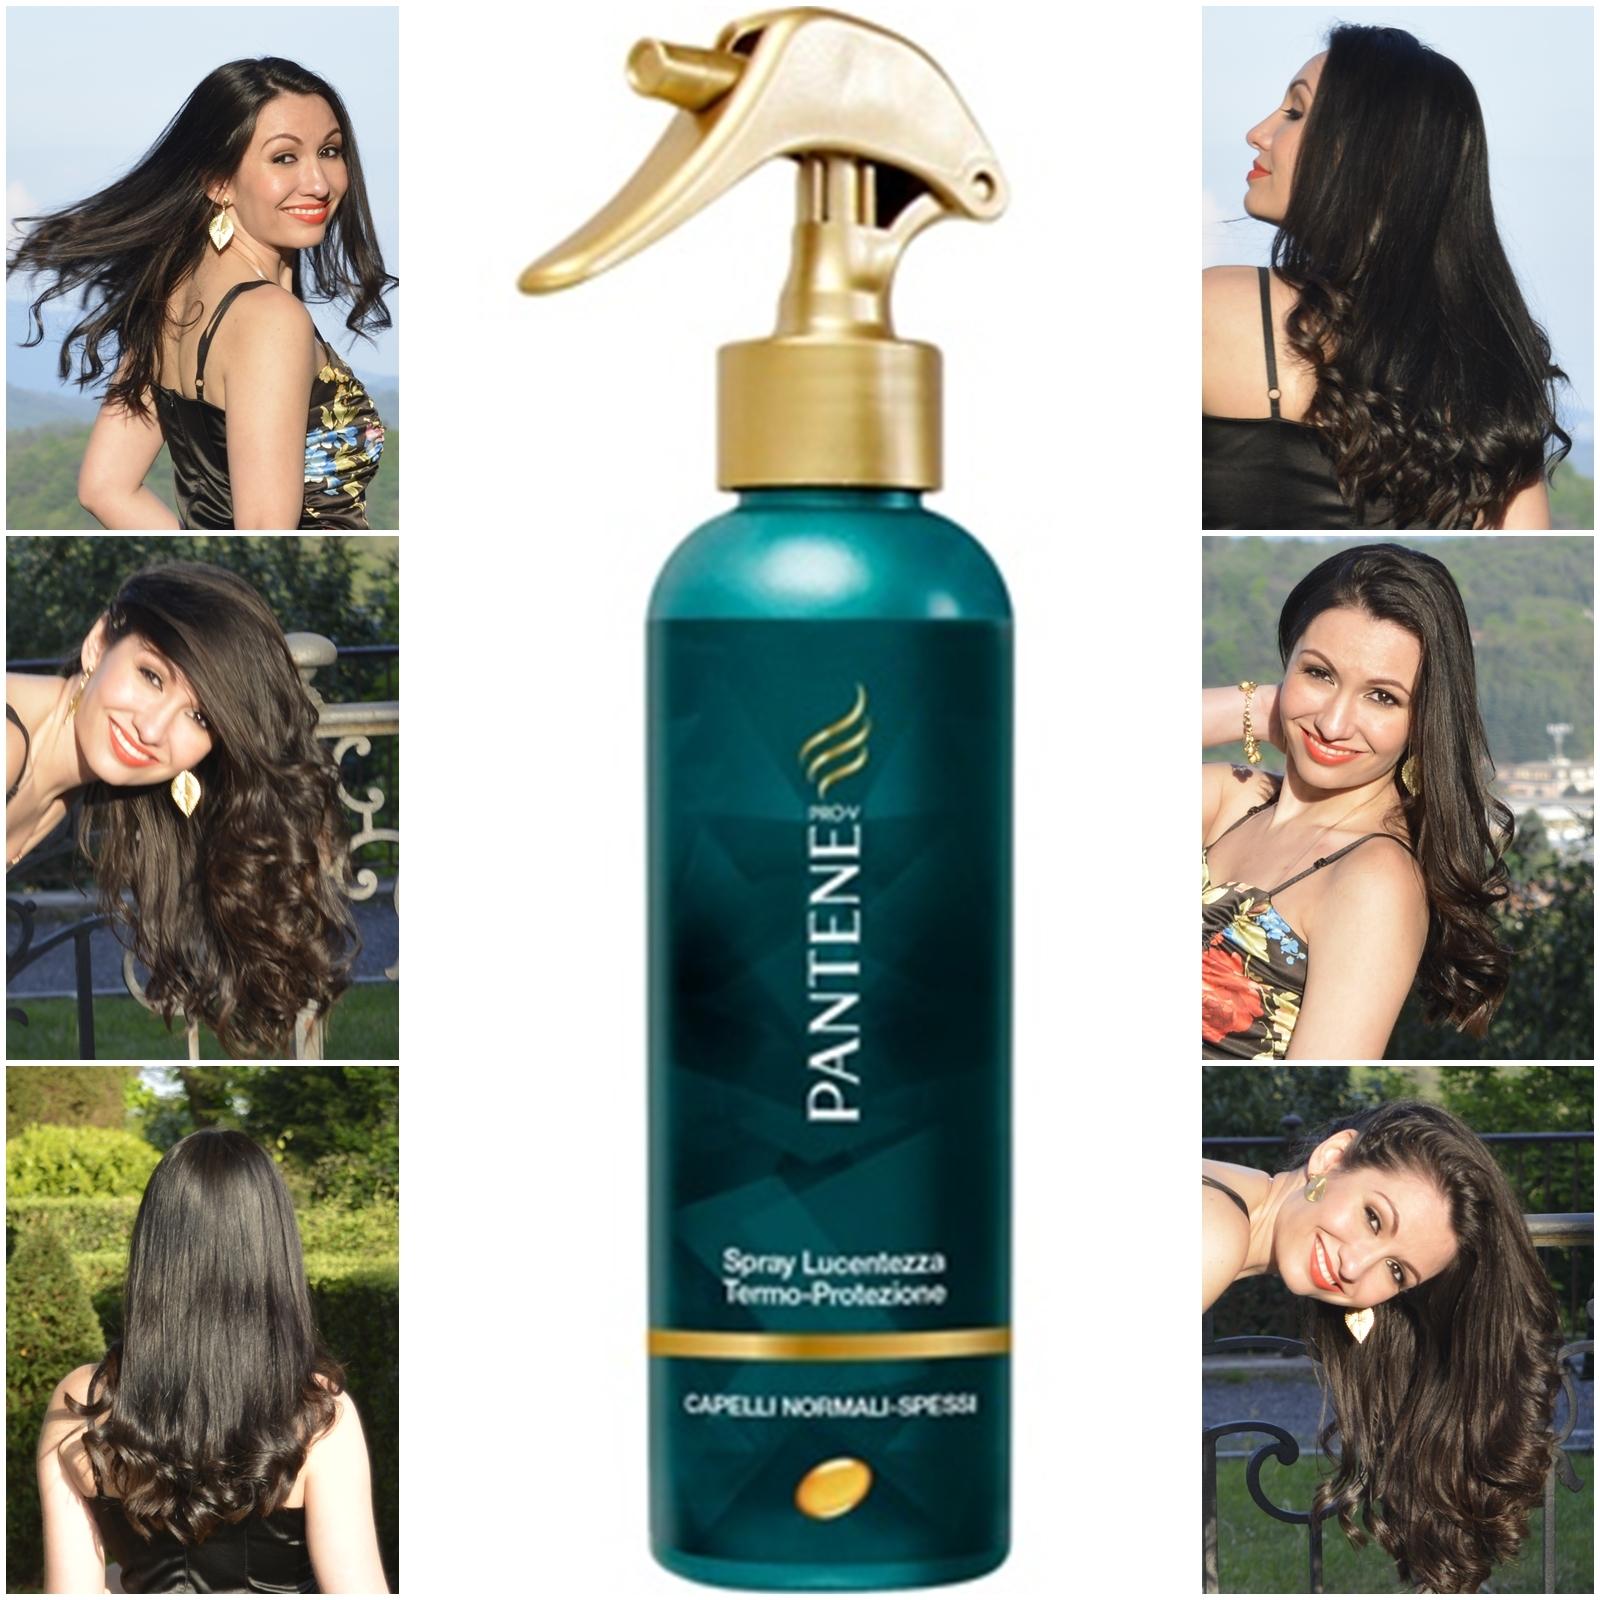 cabelos-protetor-termico-pantene-spray-lucentezza-termo-protezione-nathália-ferrara-1